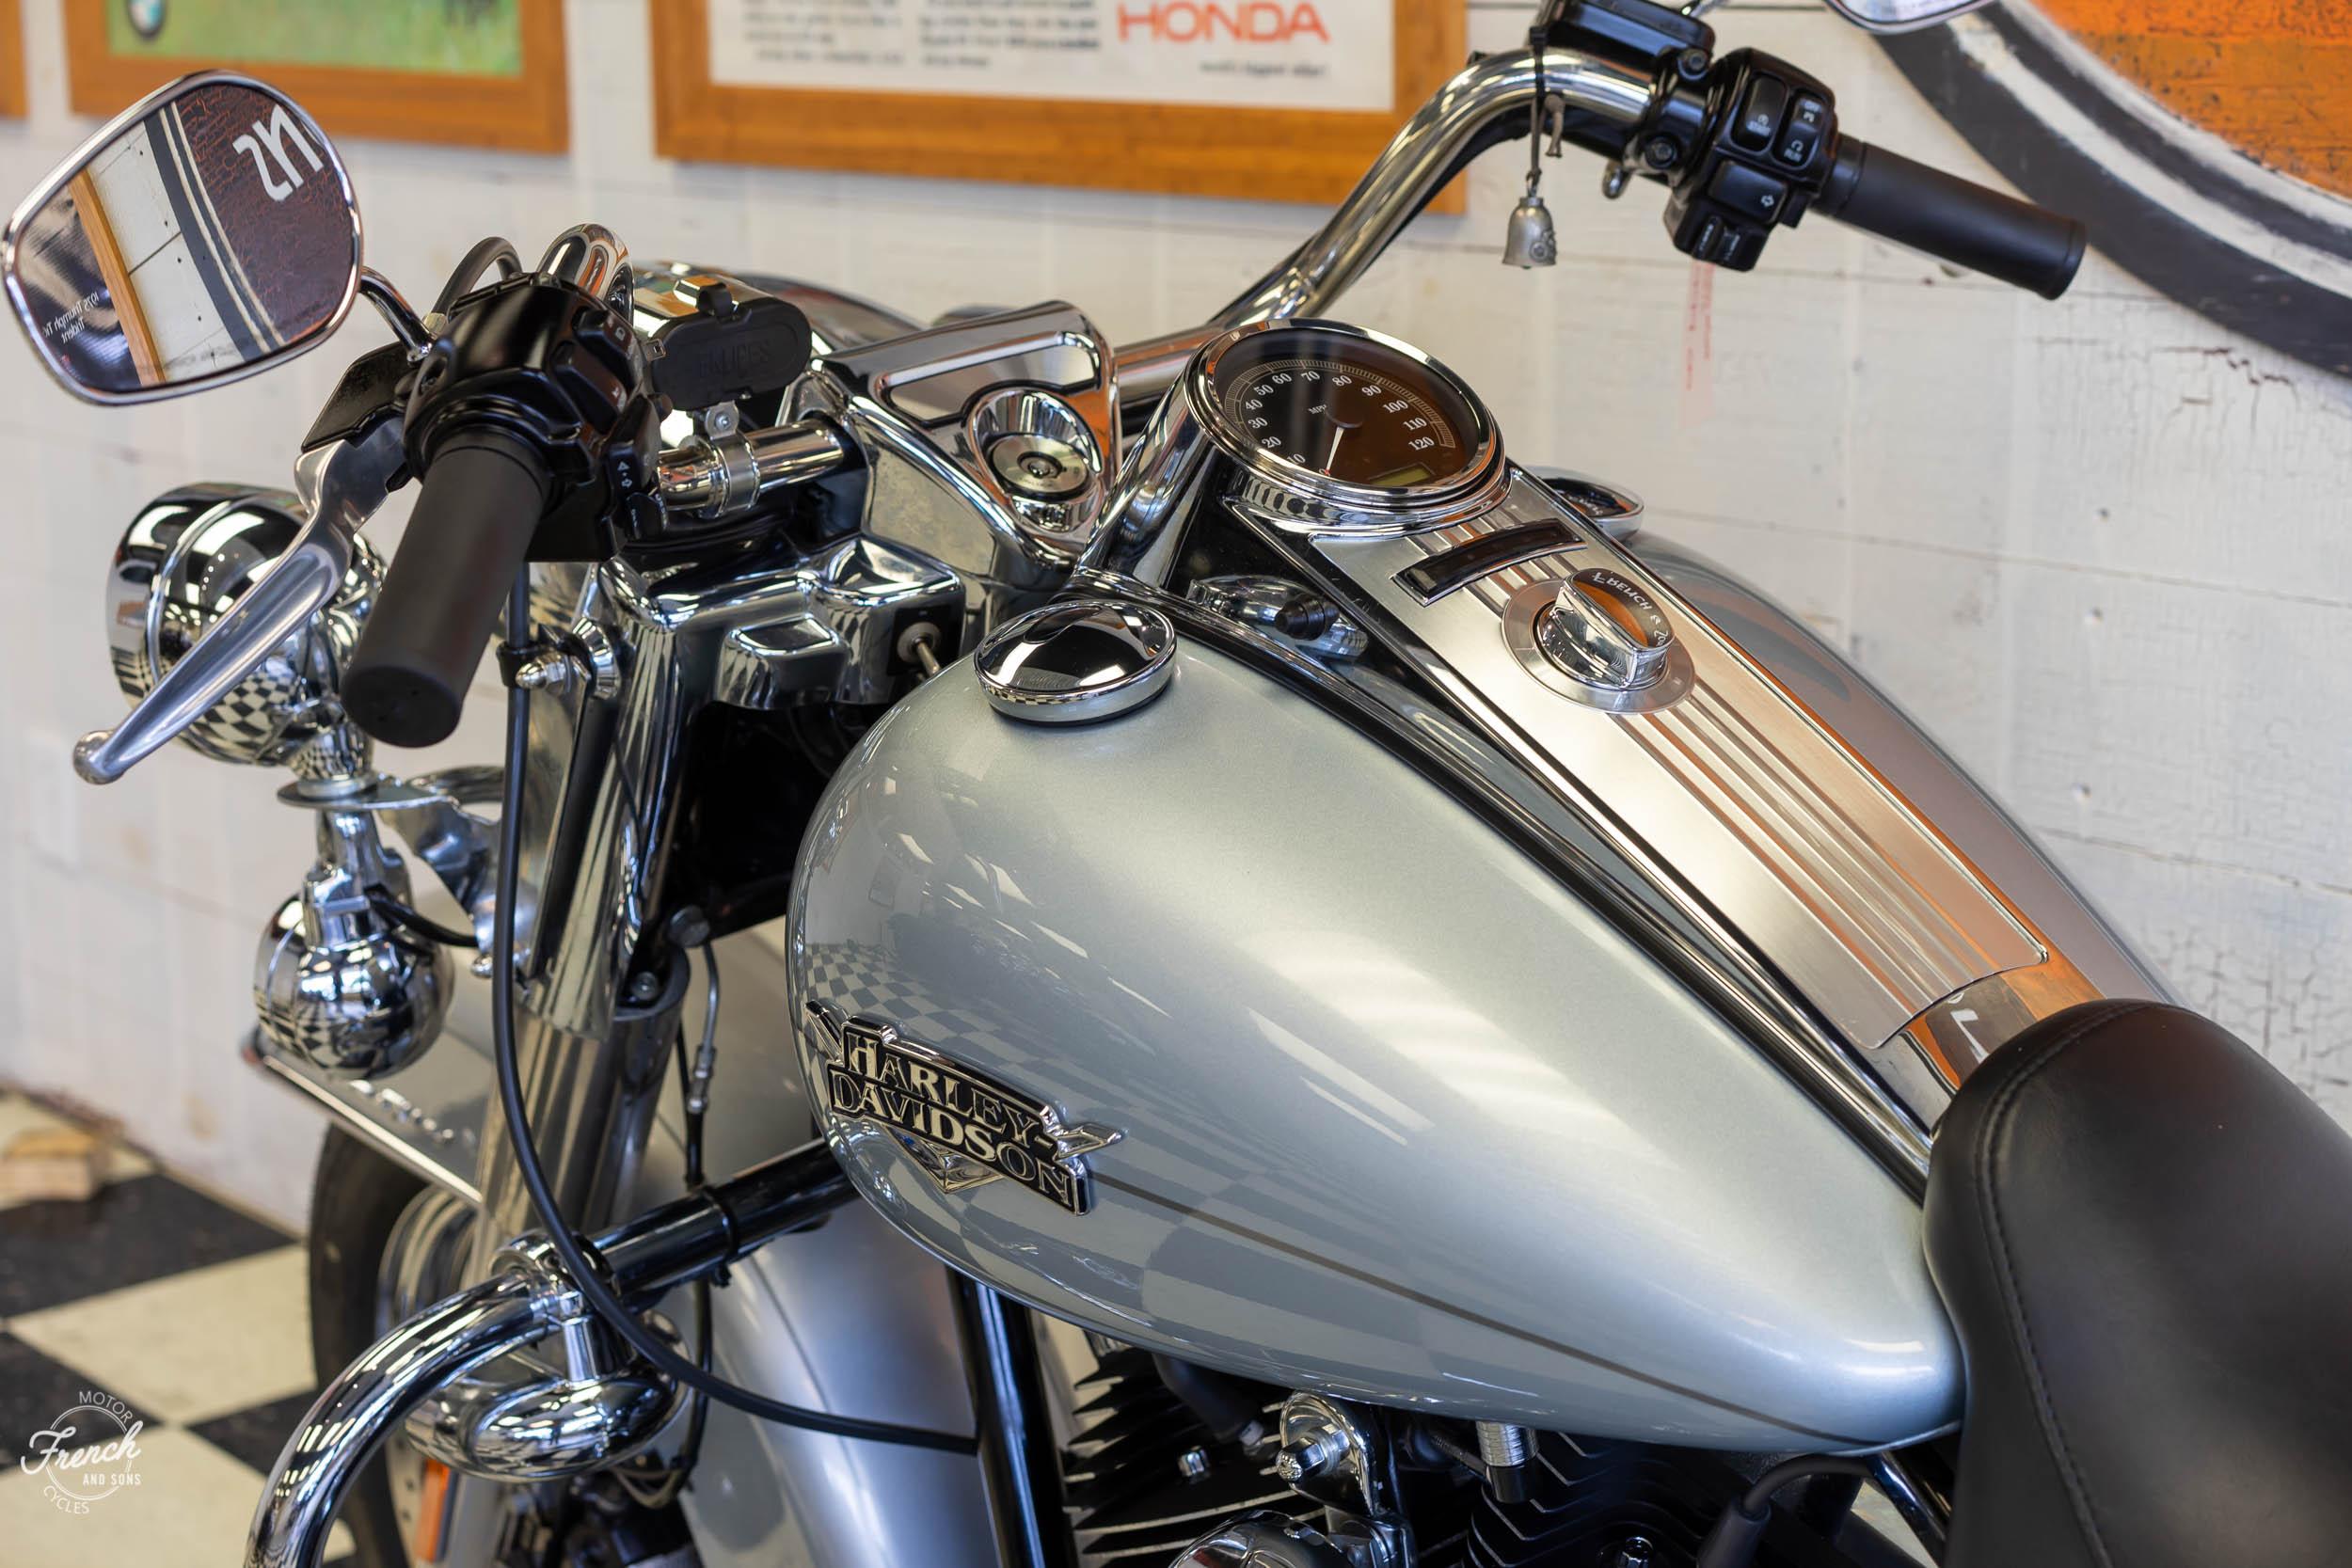 2011_Harley_davidson_road_king_silver-25.jpg